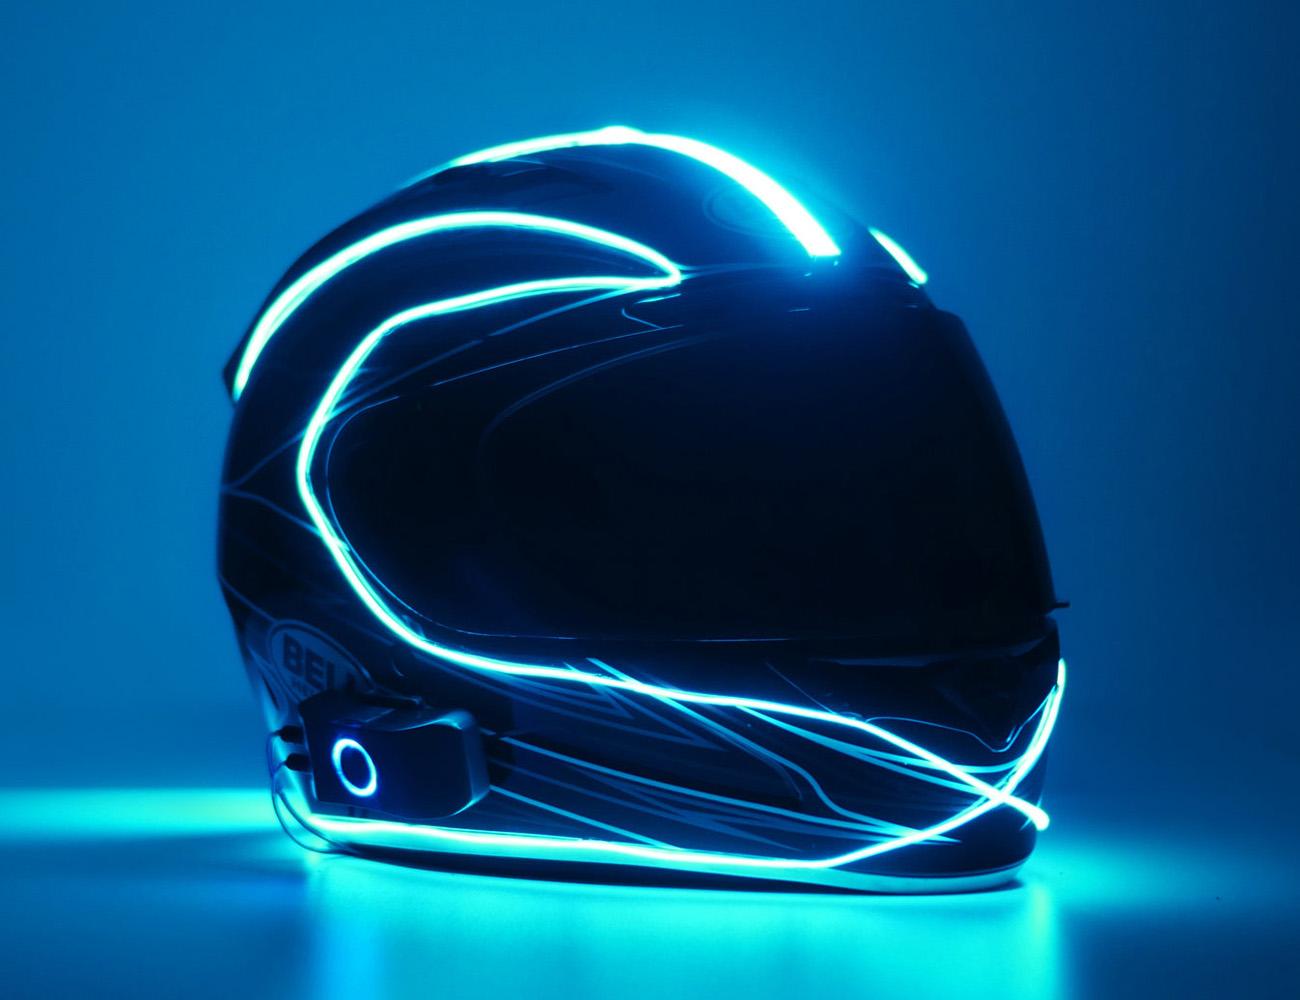 LightMode Electroluminescent Motorcycle Helmet Kit